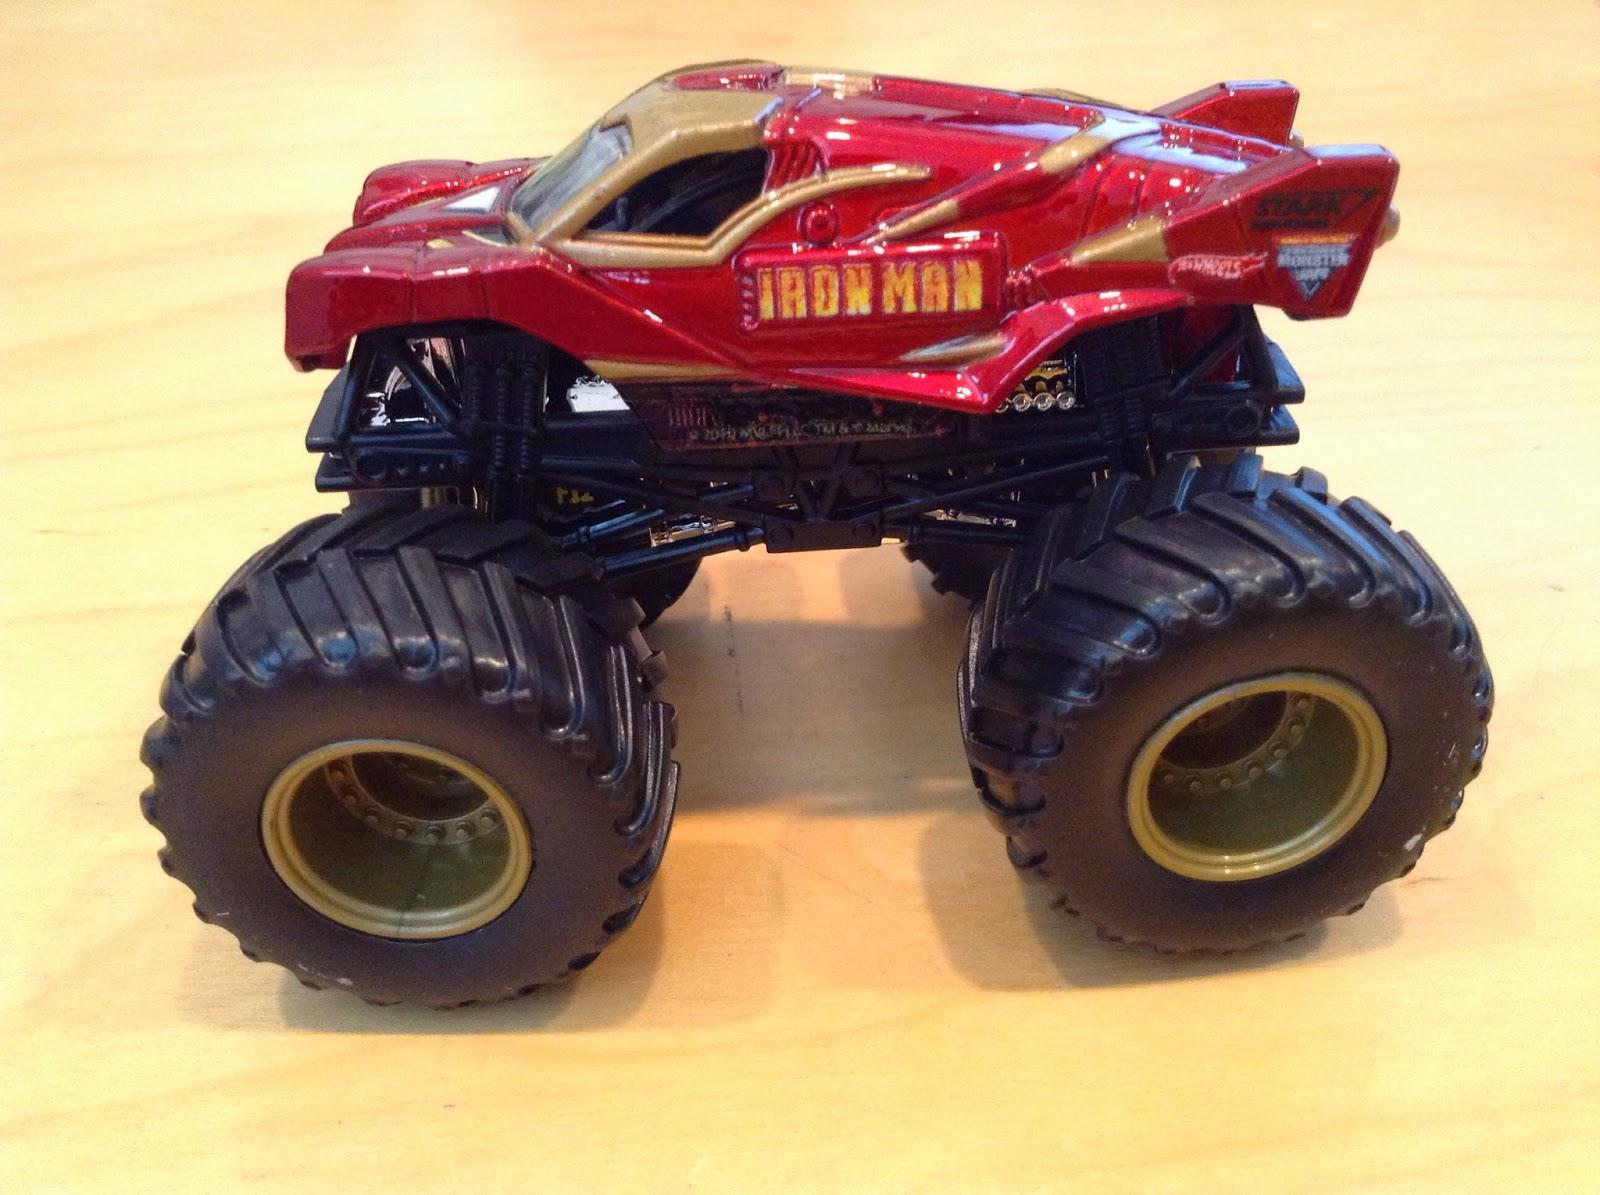 julian 39 s hot wheels blog iron man monster jam truck. Black Bedroom Furniture Sets. Home Design Ideas